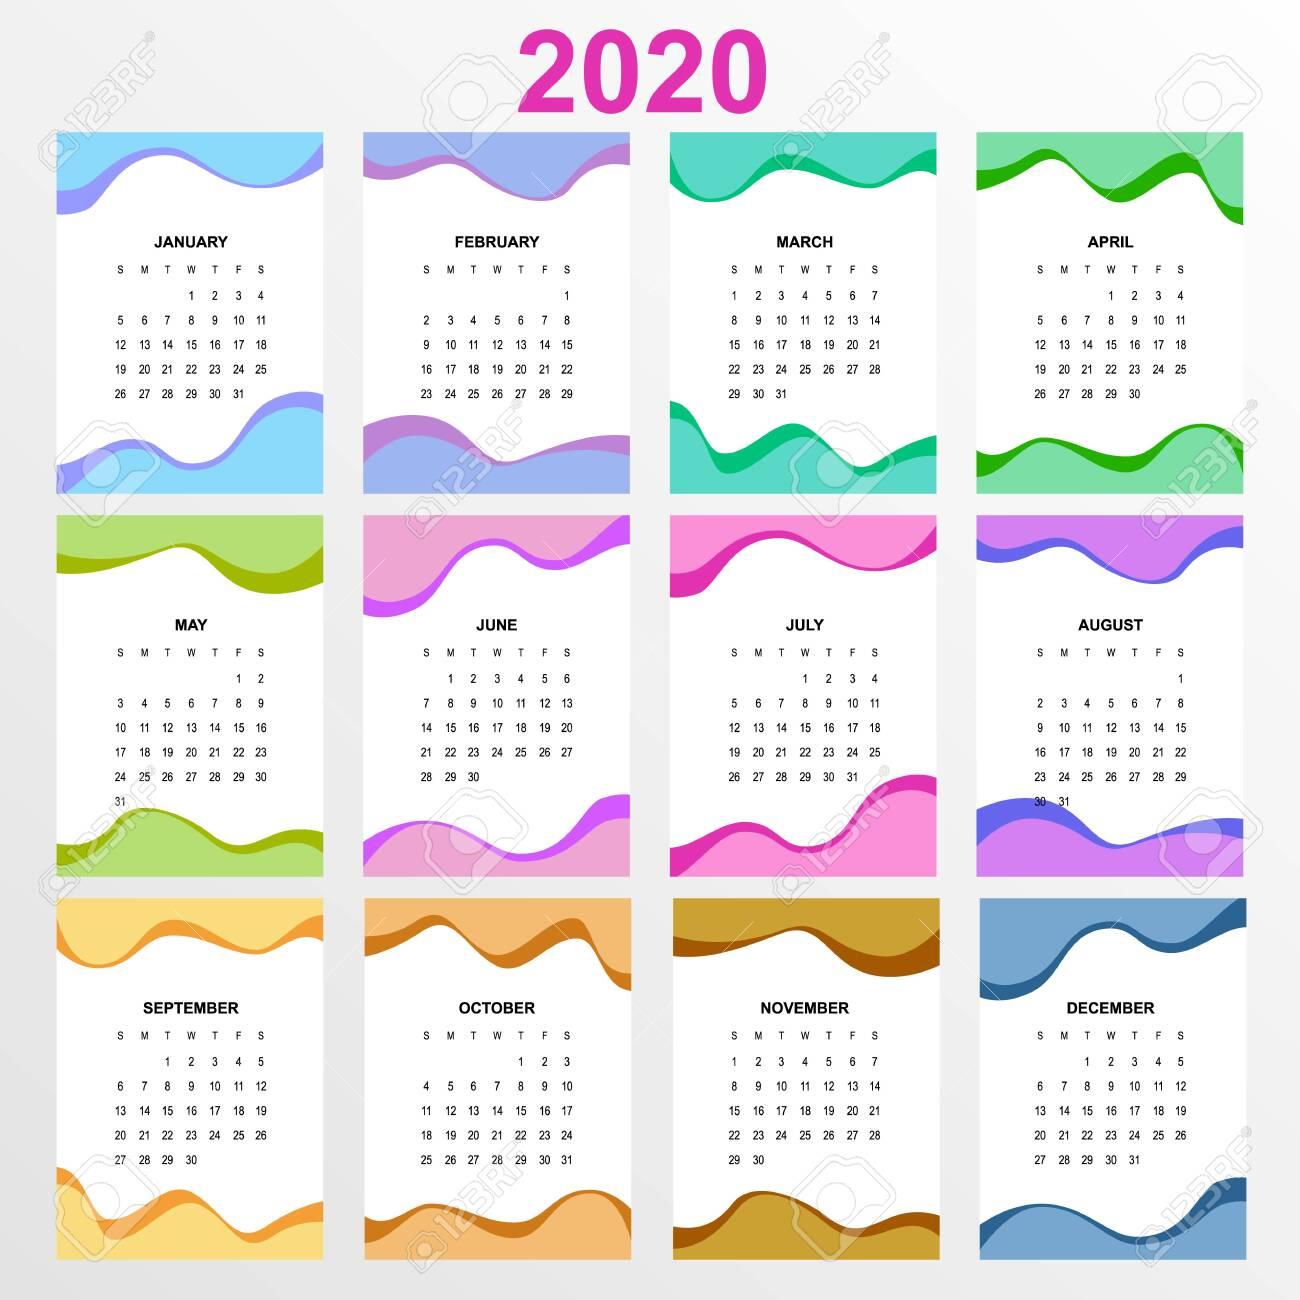 2020 Year Calendar. Holiday Event Planner. Week Starts Sunday